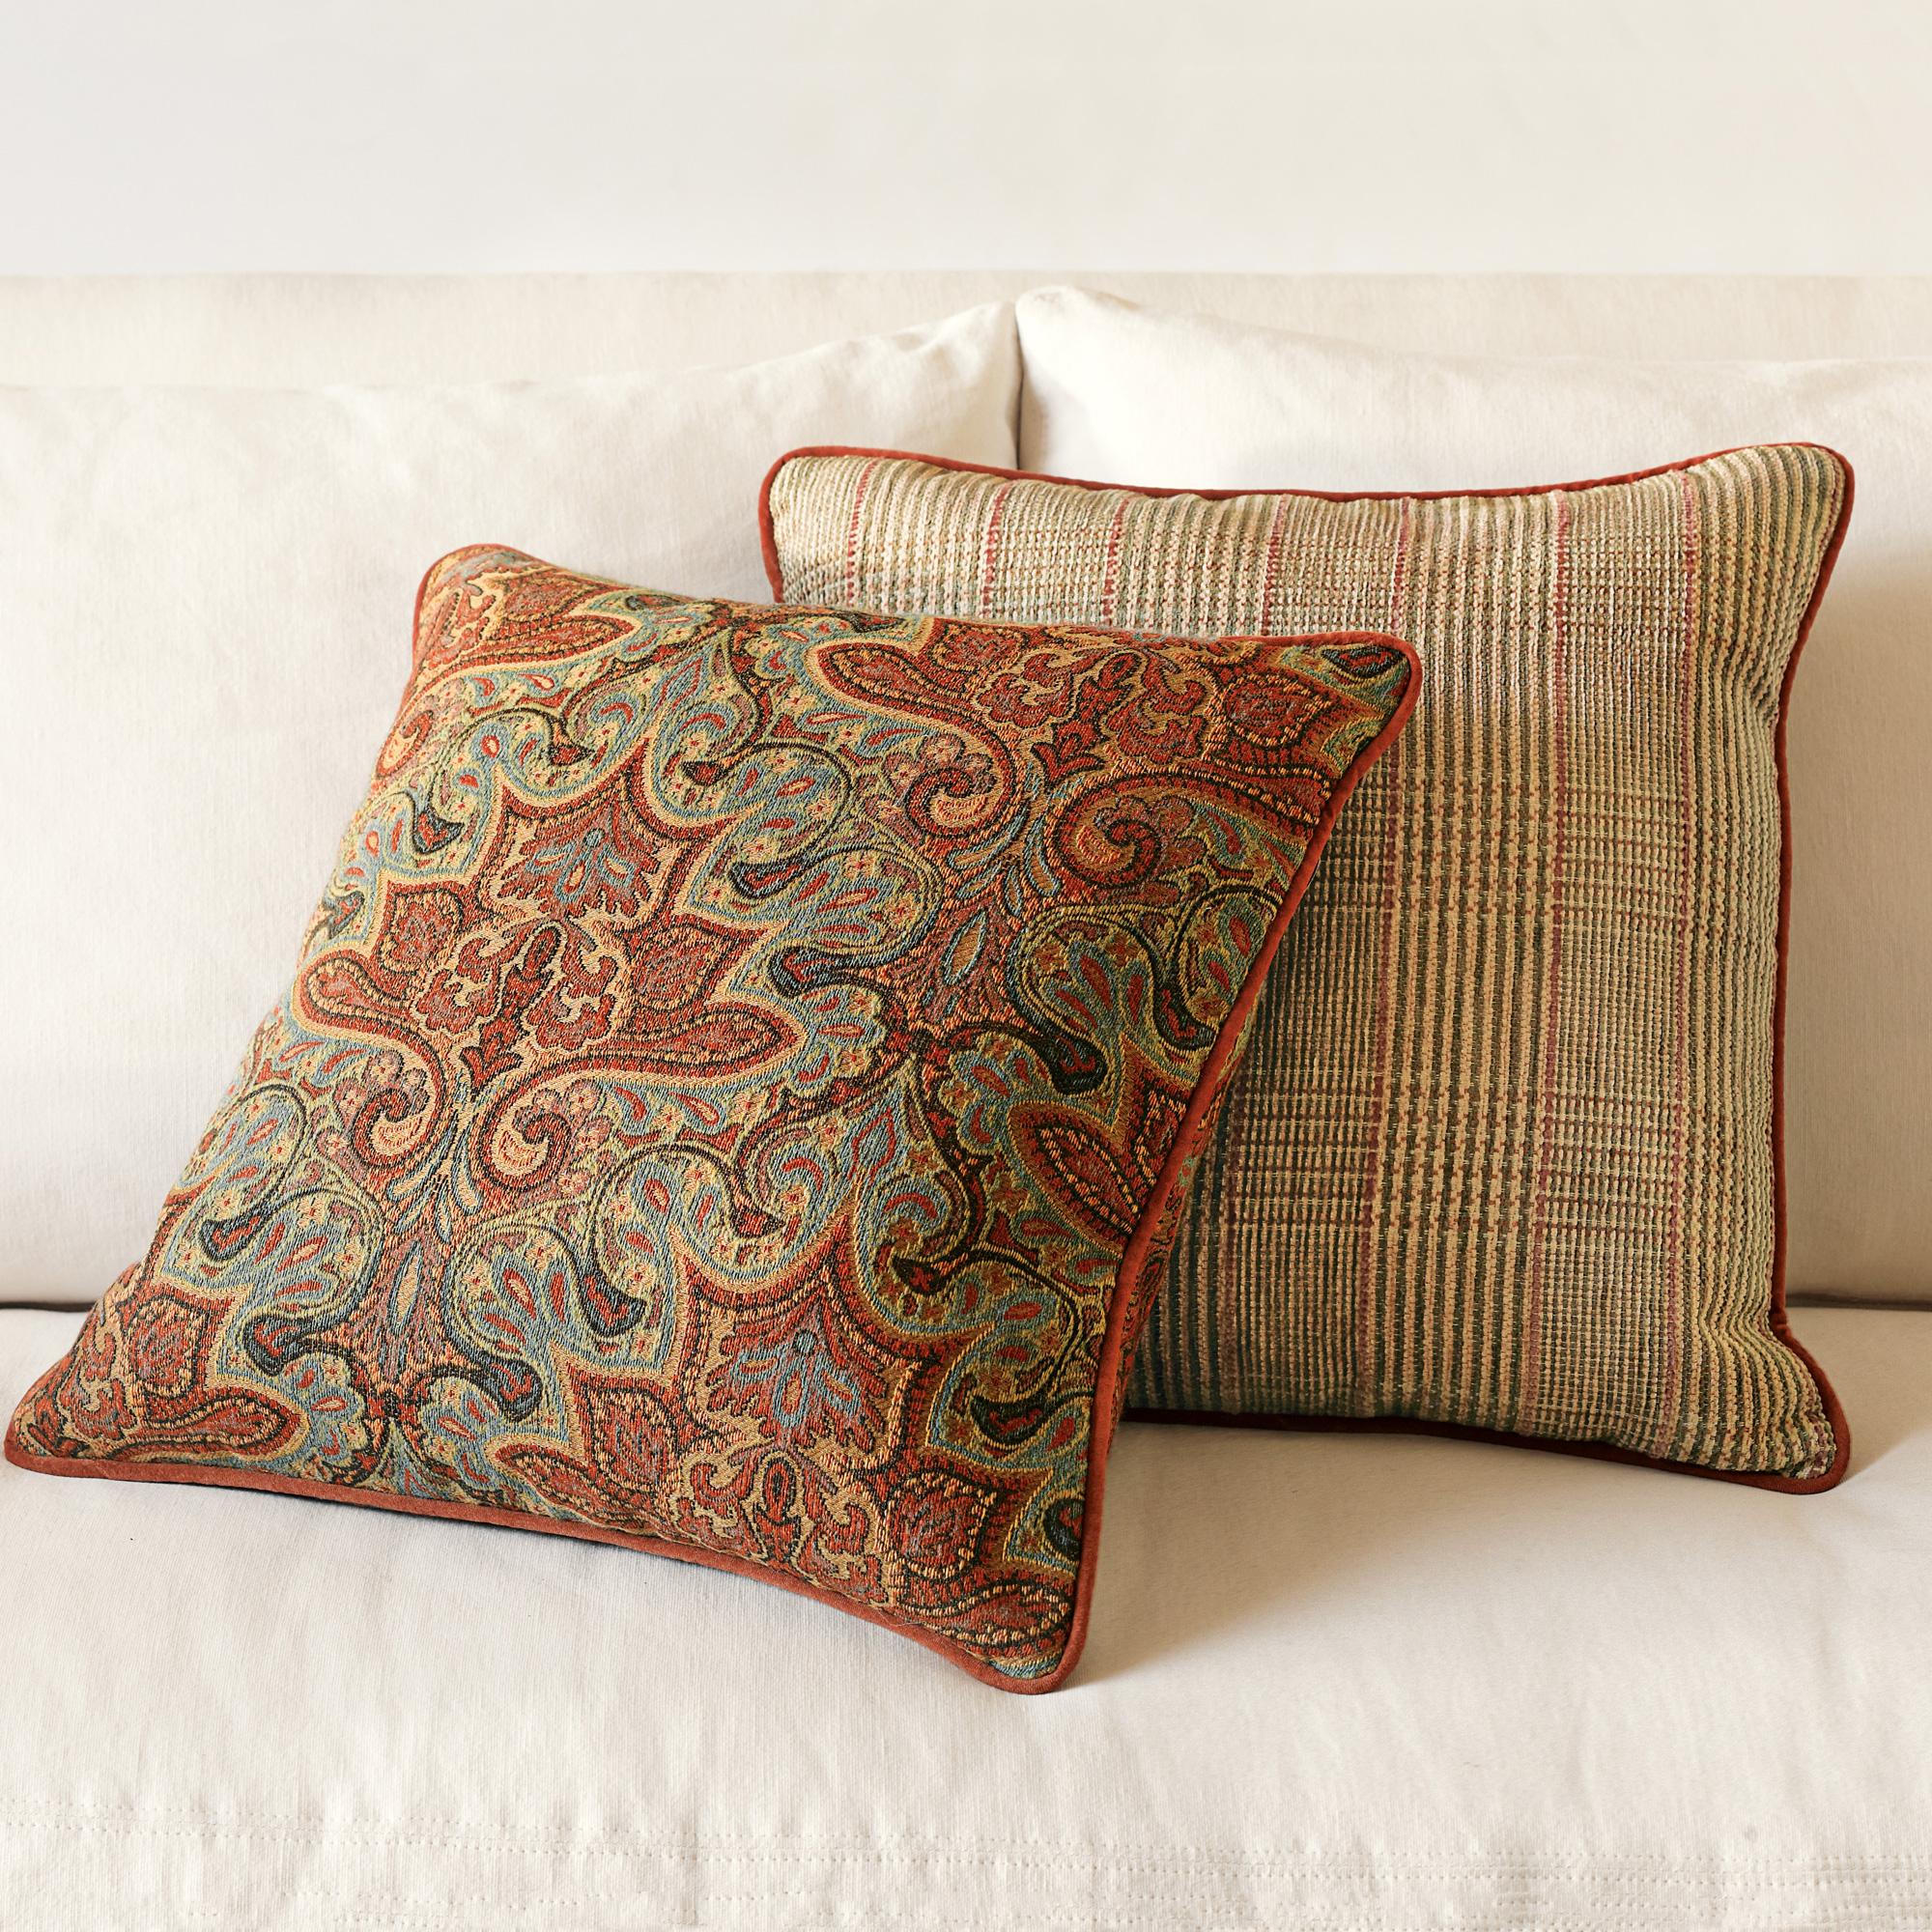 Throw Pillows Home : Greenwich Pillows Gump s